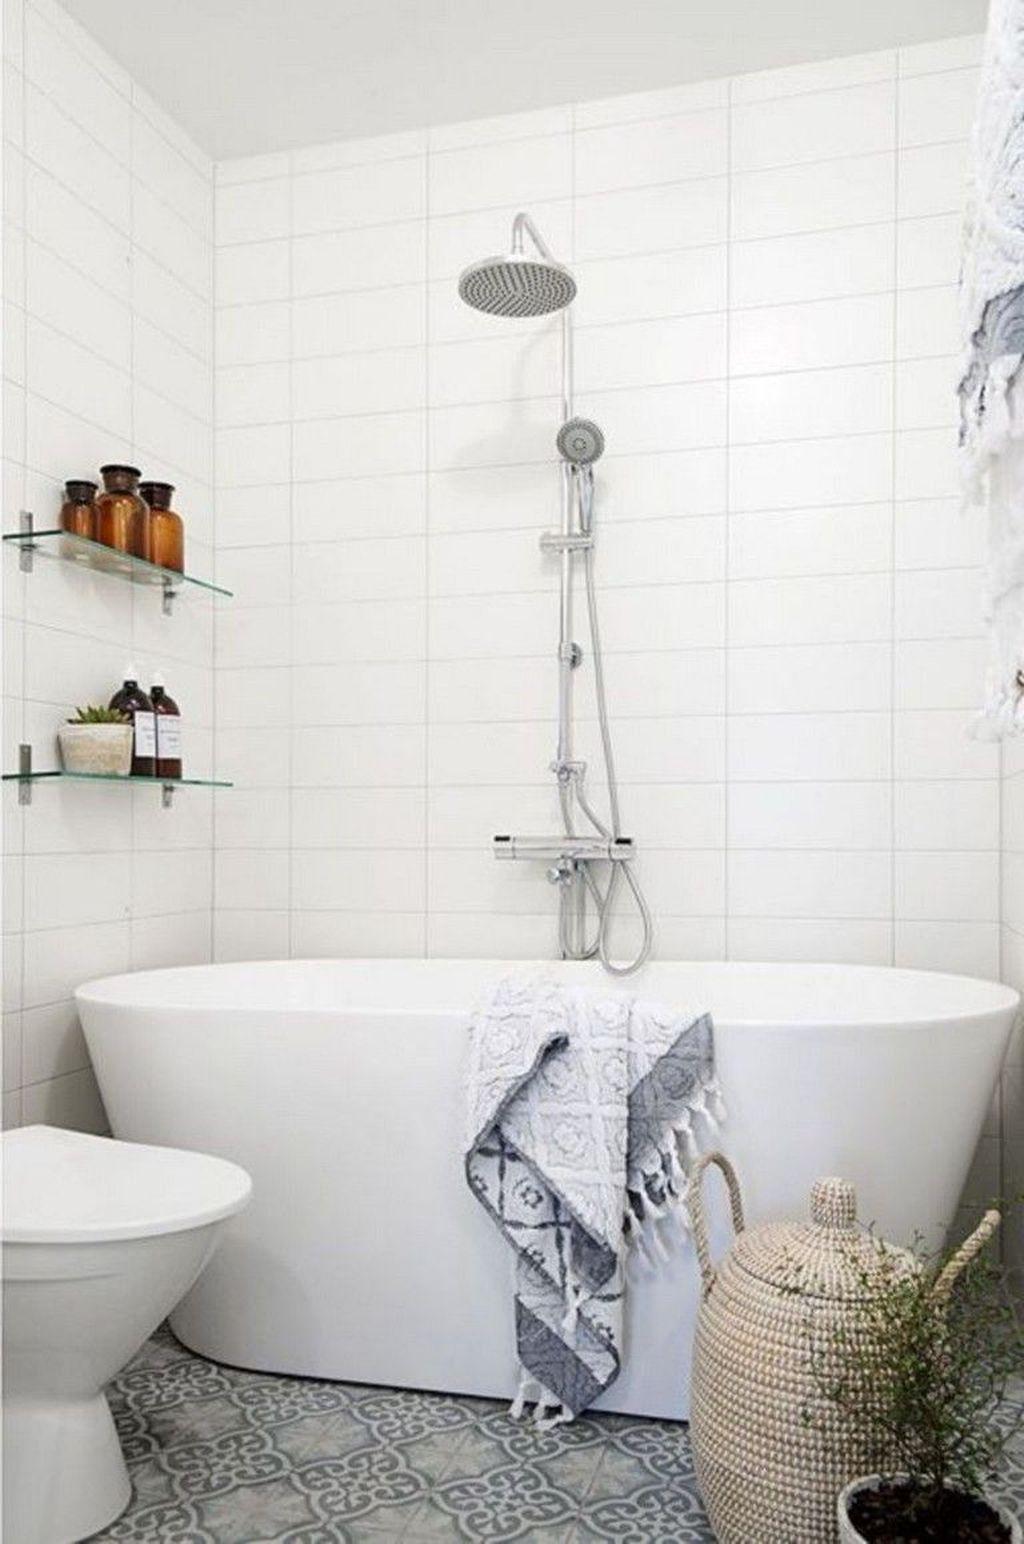 Unusual Bathroom Design Ideas You Need To Know 15